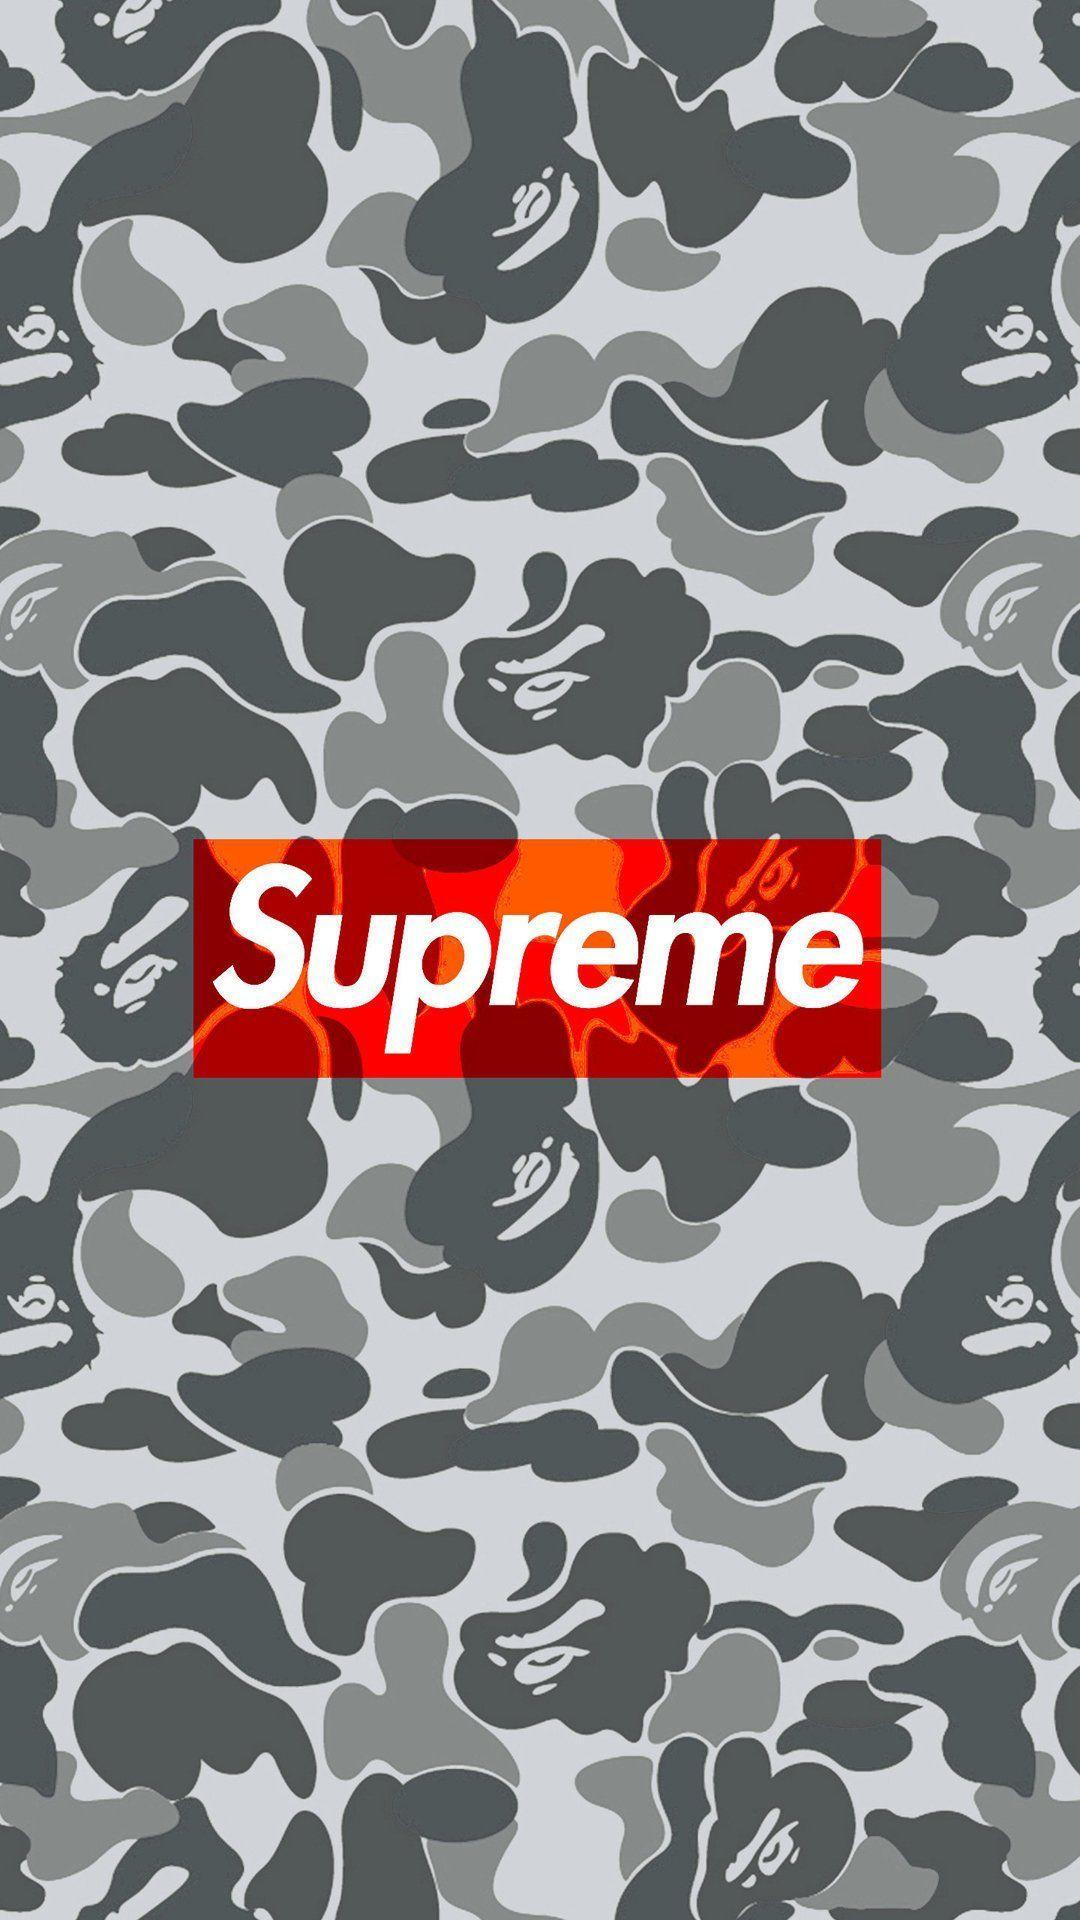 Rose Gold Nike Phone Wallpaper In 2020 Supreme Iphone Wallpaper Camo Wallpaper Supreme Wallpaper